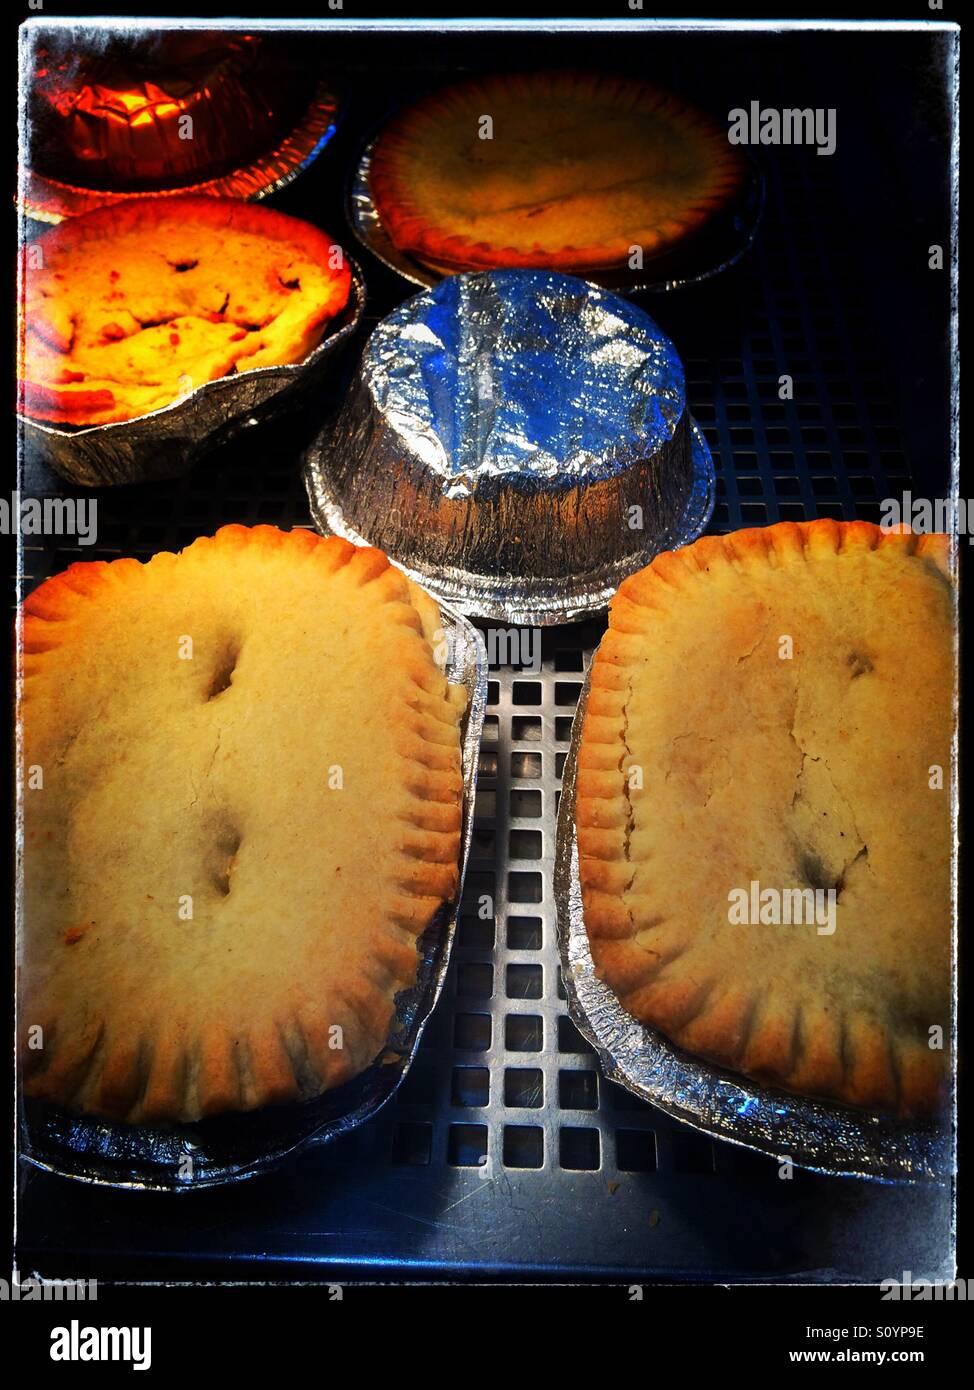 Pies keeping warm Stock Photo